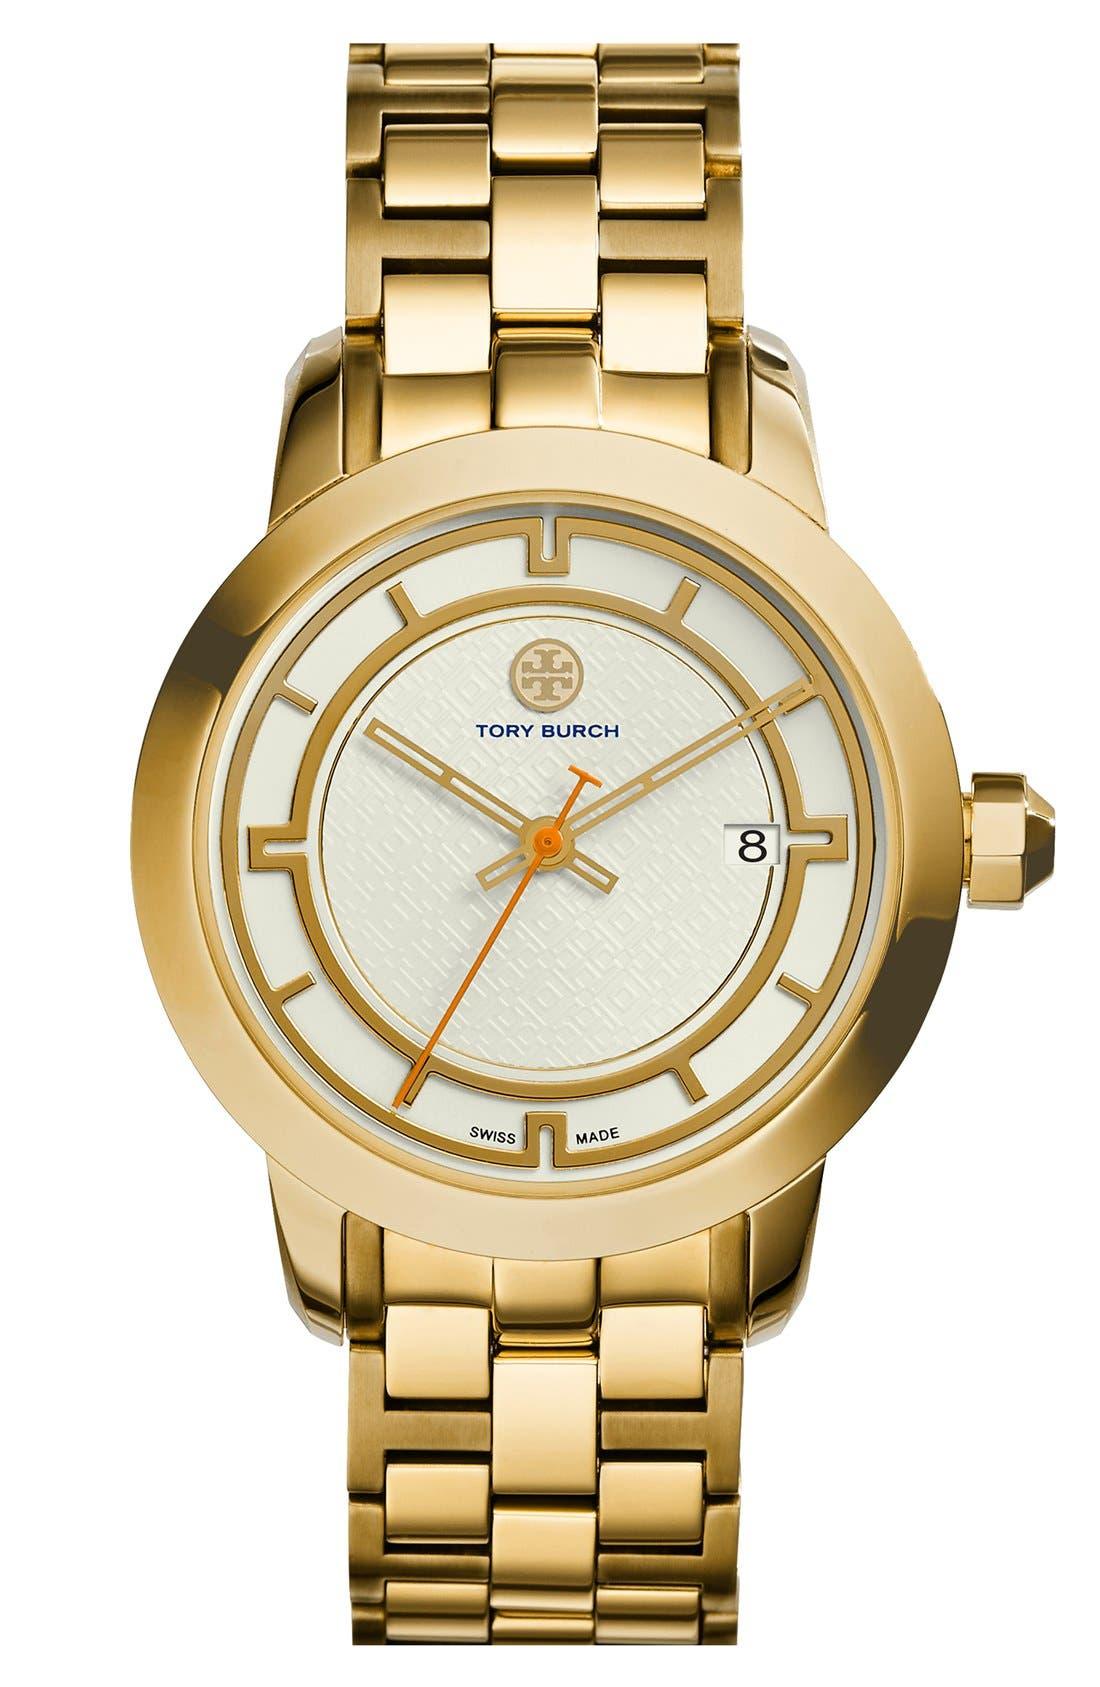 Main Image - Tory Burch 'Tory' Large Round Bracelet Watch, 37mm